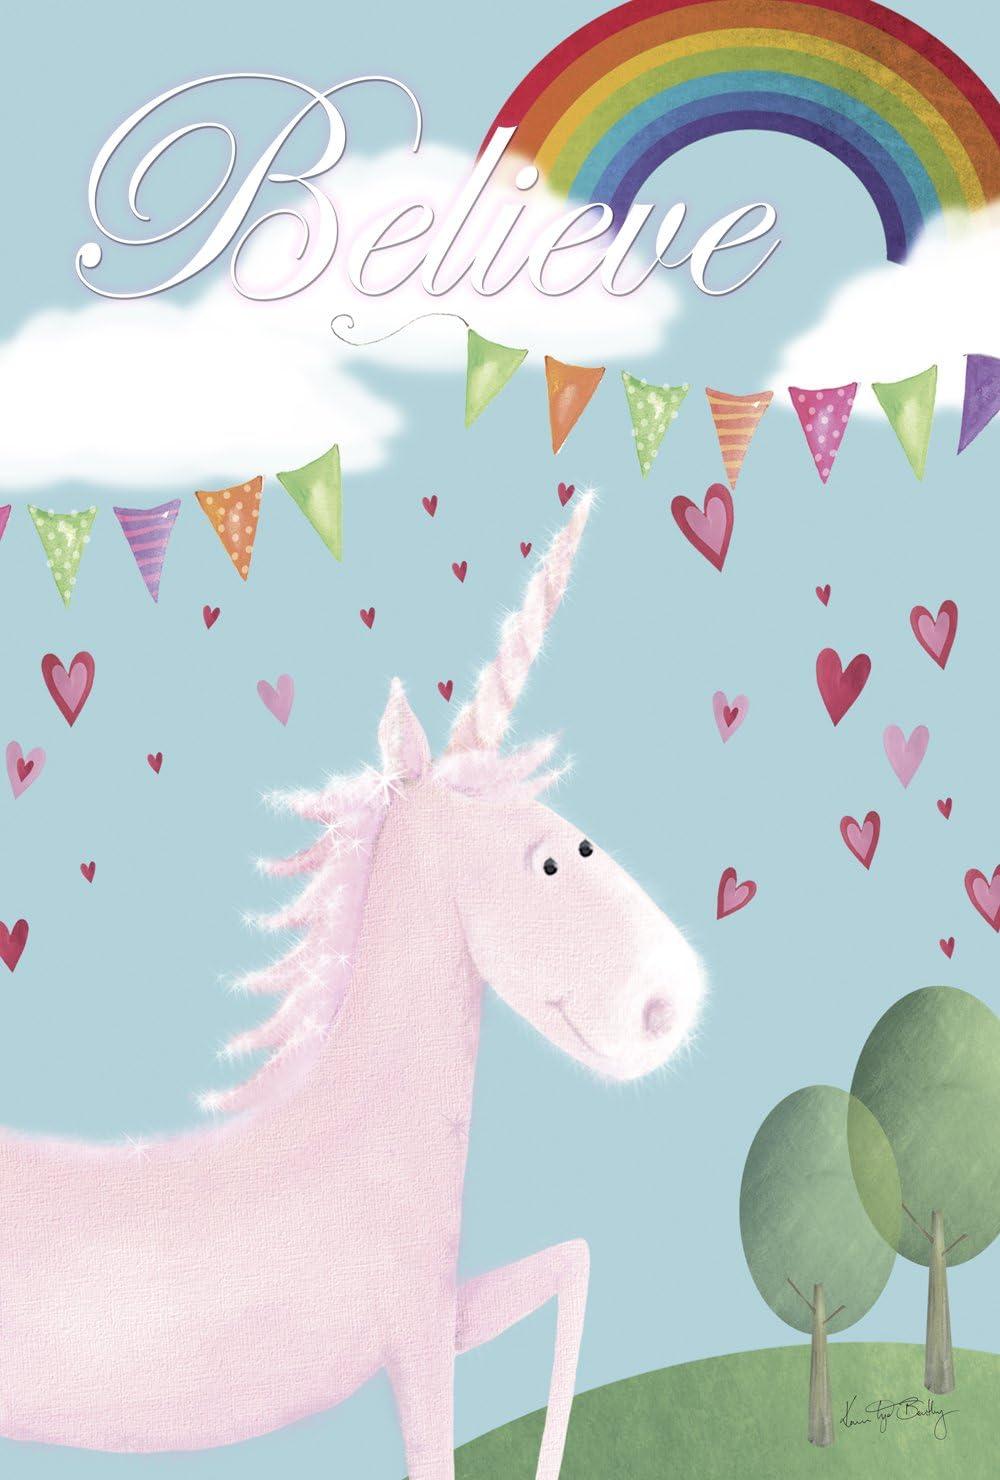 Toland Home Garden Believe In Unicorns 12.5. x 18 Inch Decorative Cute Mythical Rainbow Heart Unicorn Garden Flag